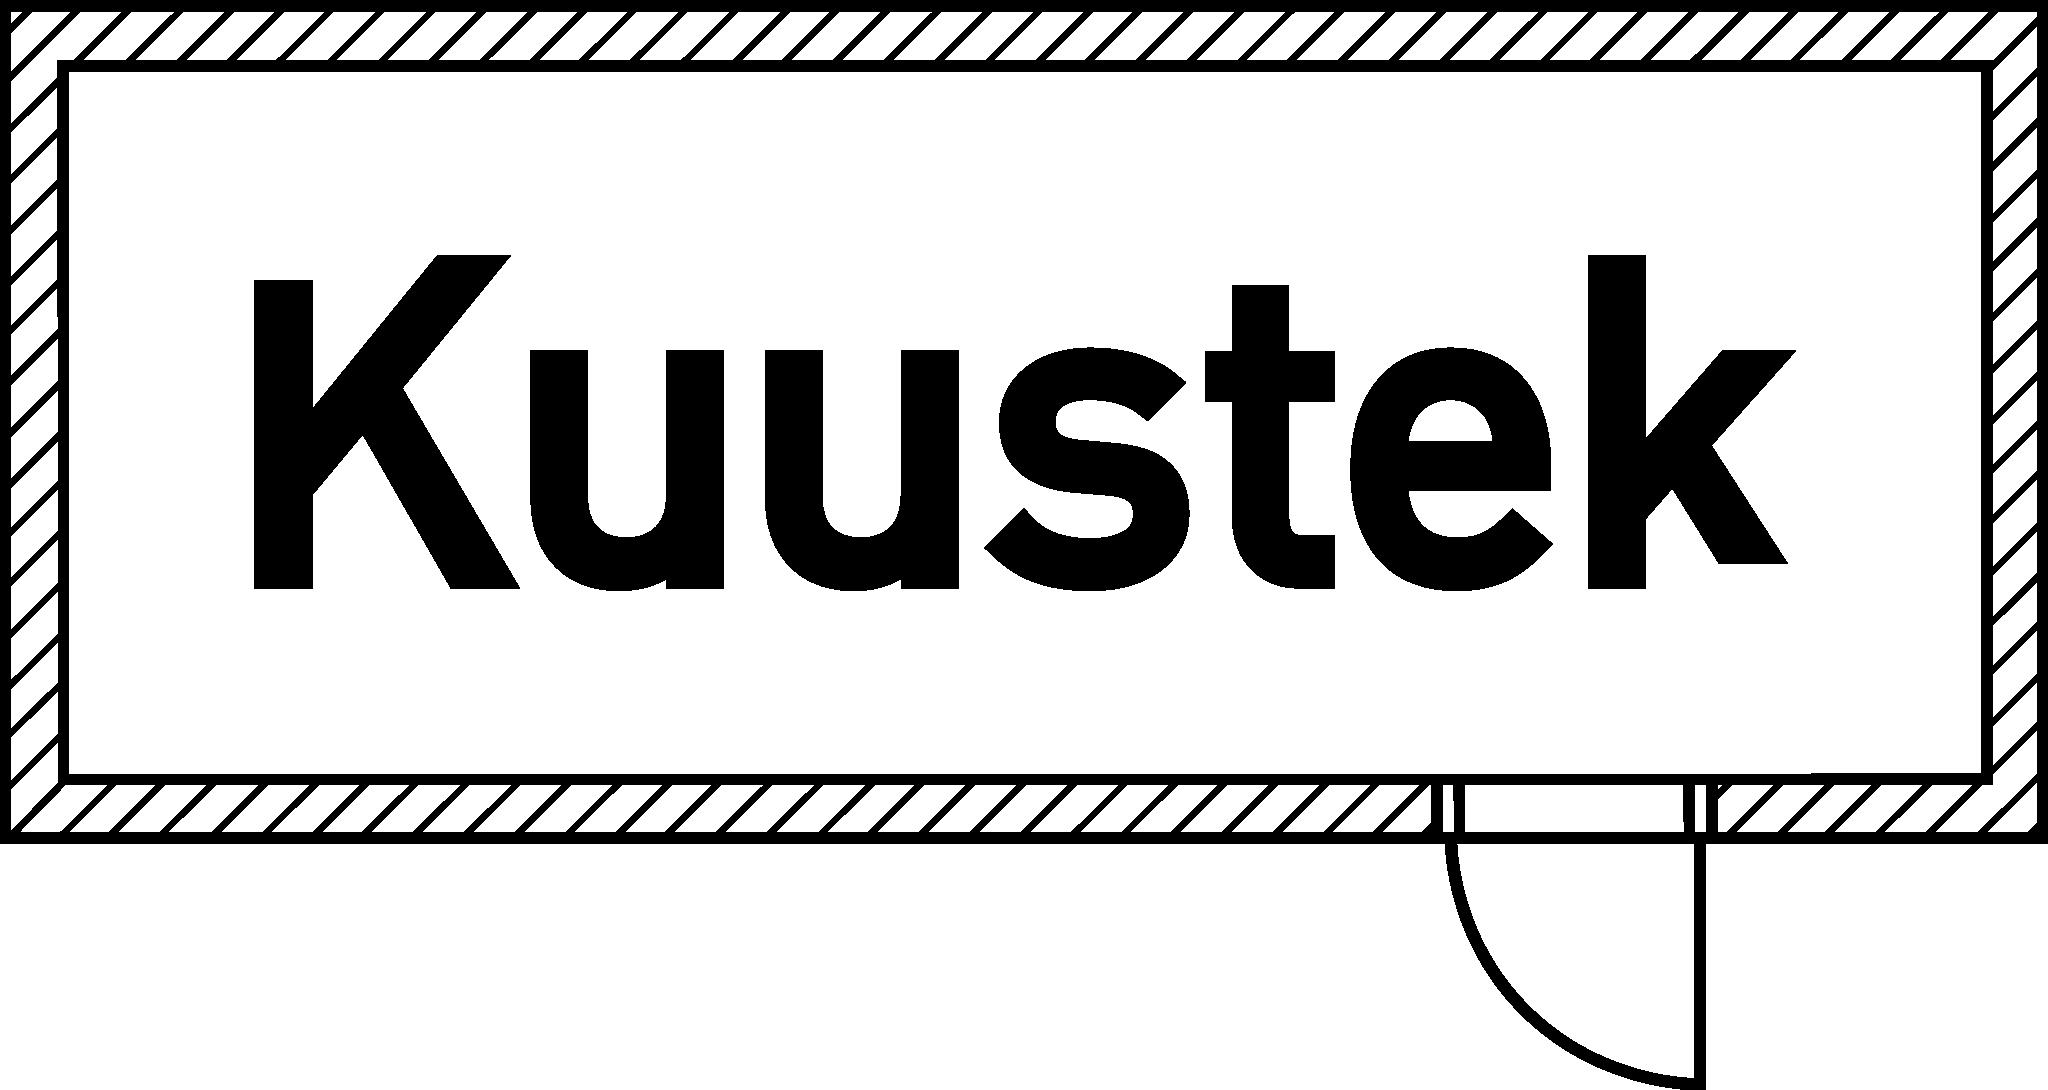 kuustek logo